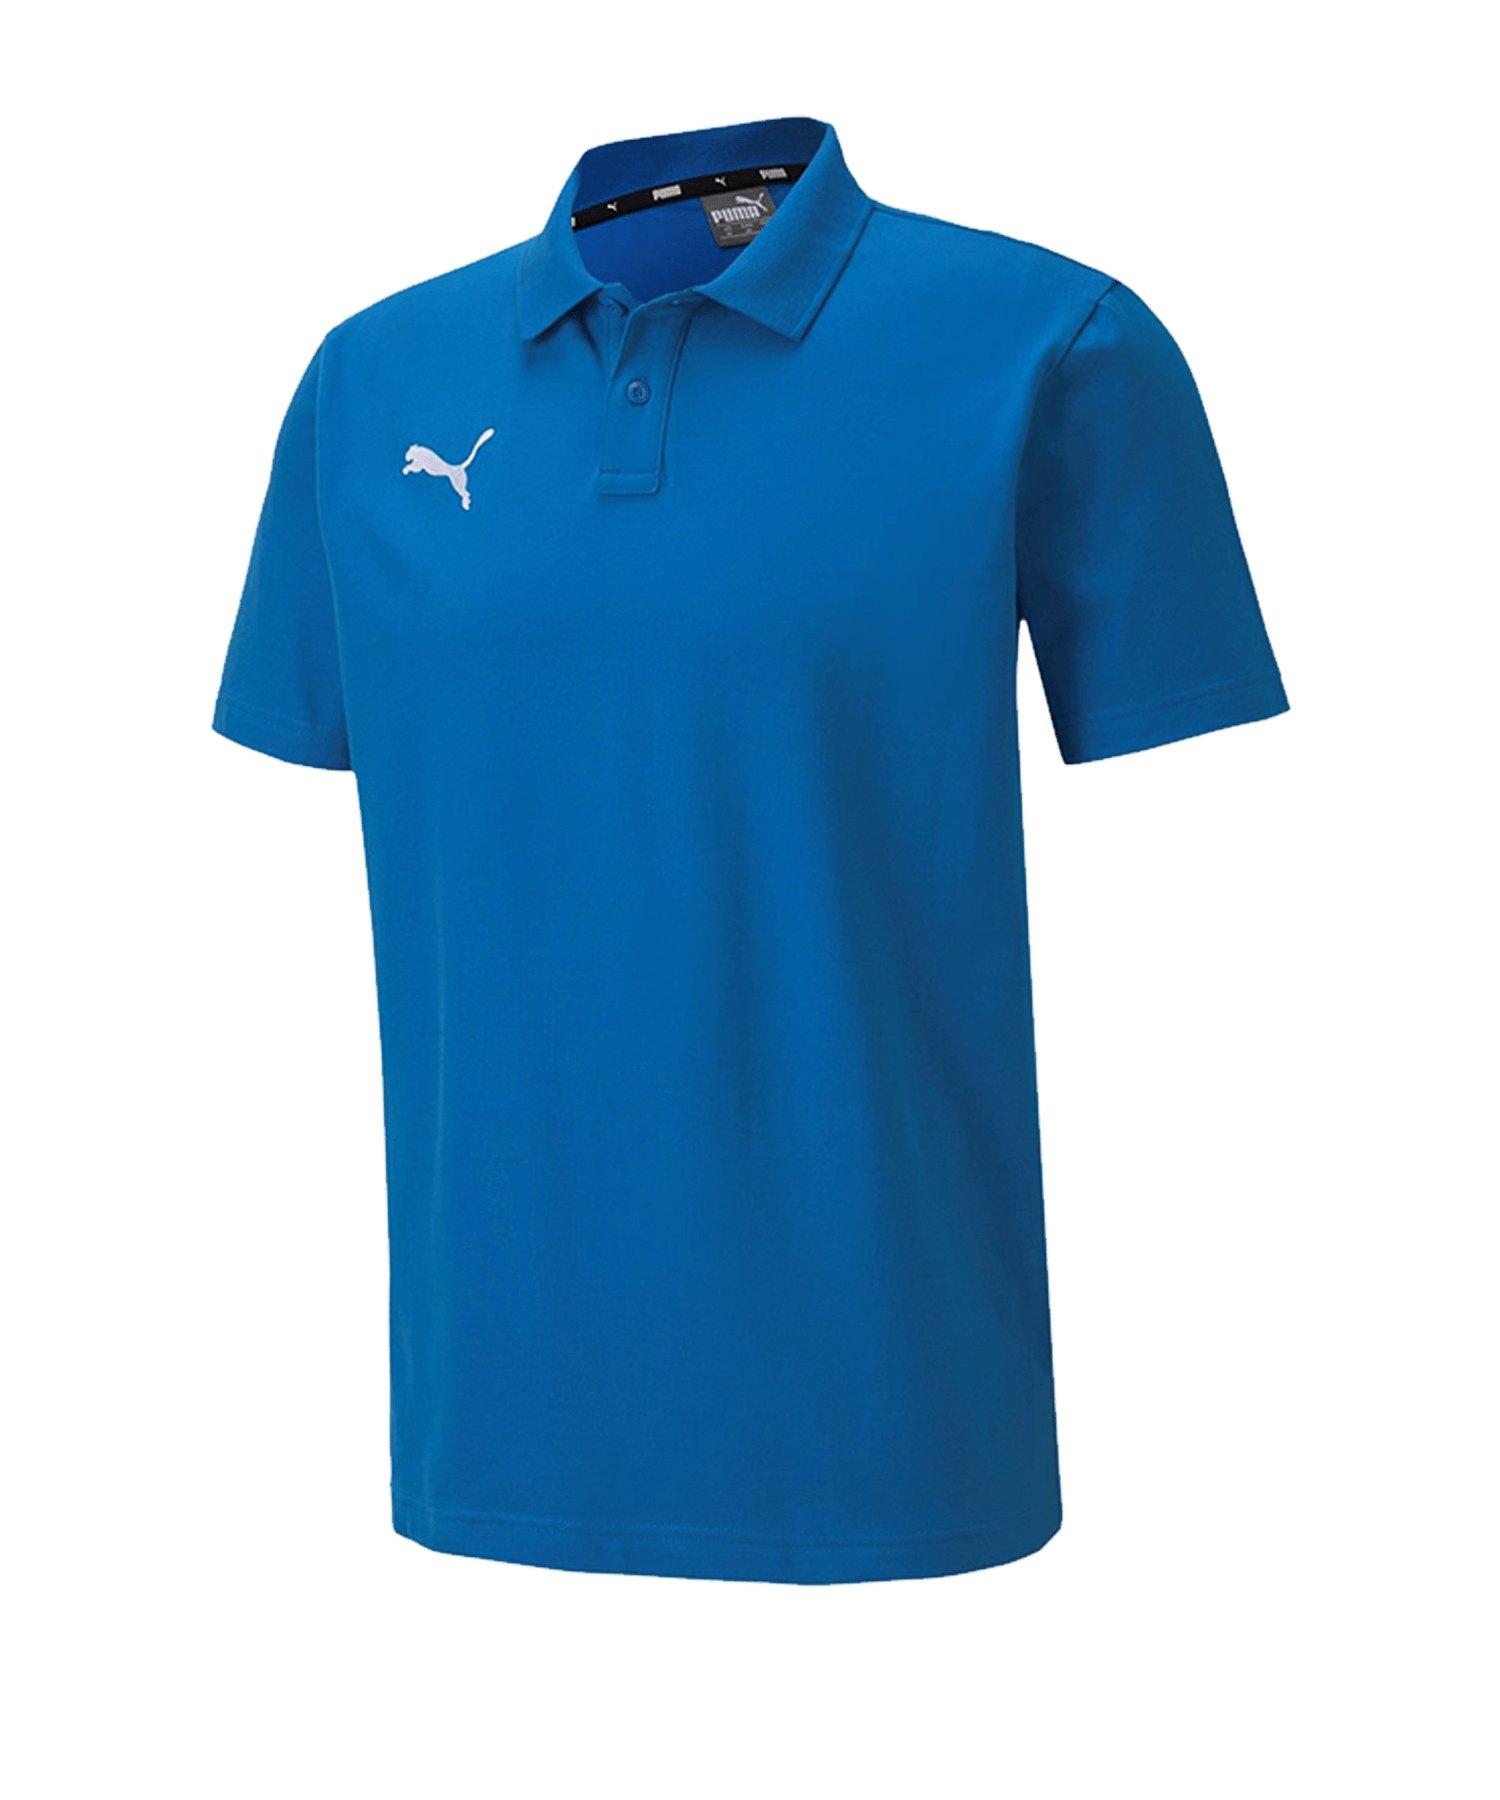 PUMA teamGOAL 23 Casuals Poloshirt Blau F02 - blau